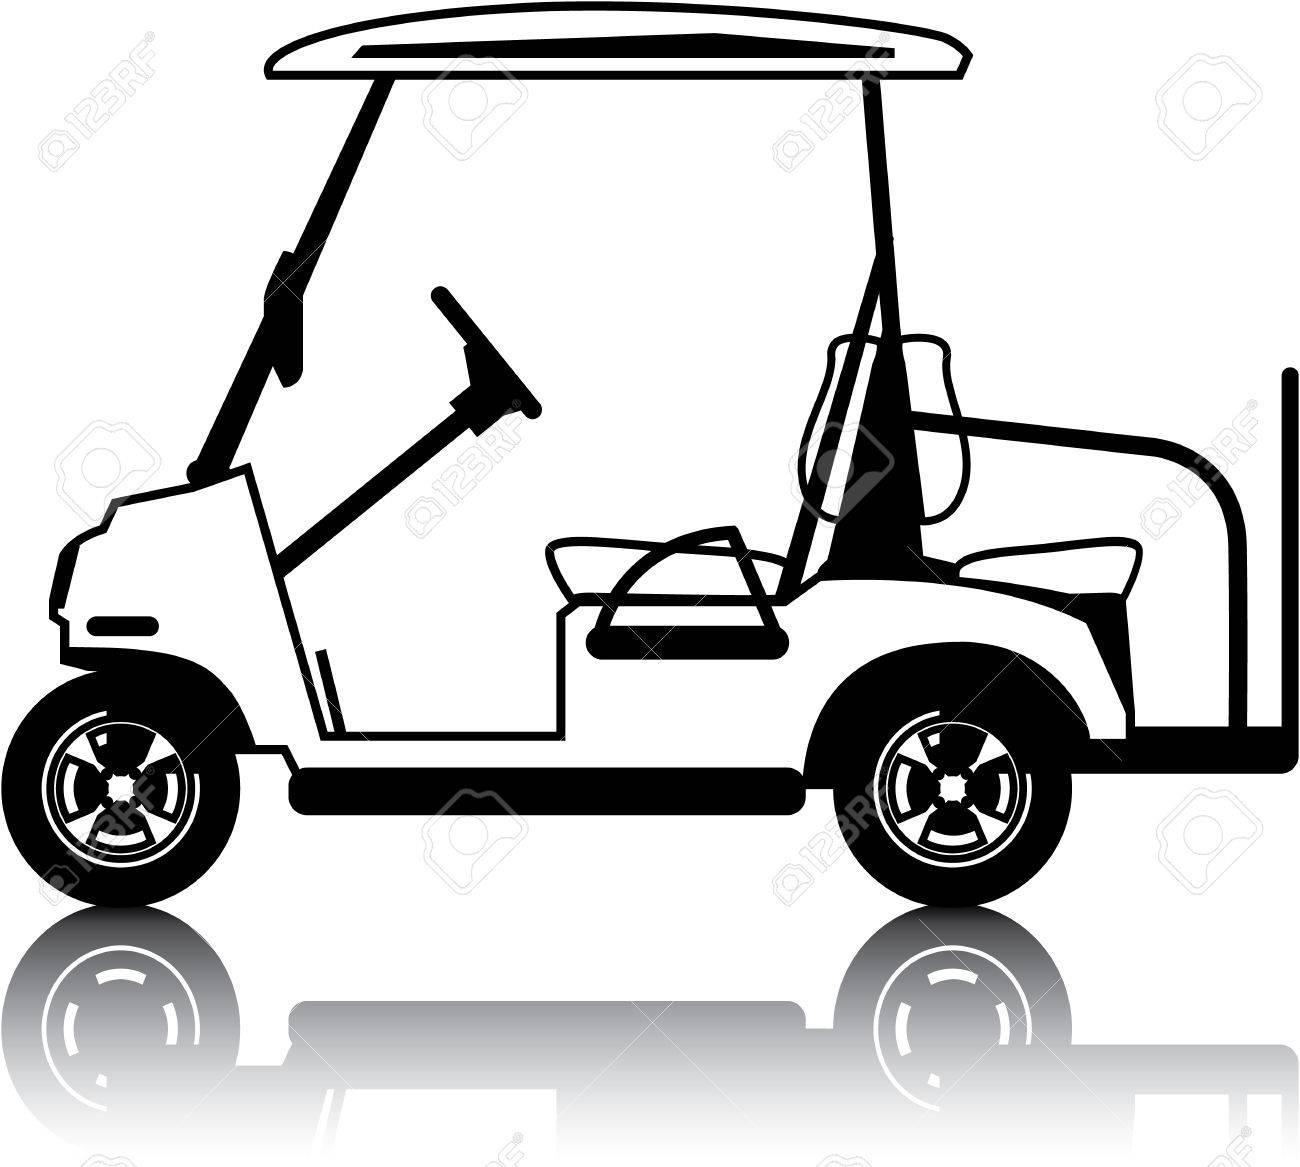 white golf cart vehicle clip art vector image royalty free cliparts rh 123rf com golf cart clip art images golf cart clip art black and white